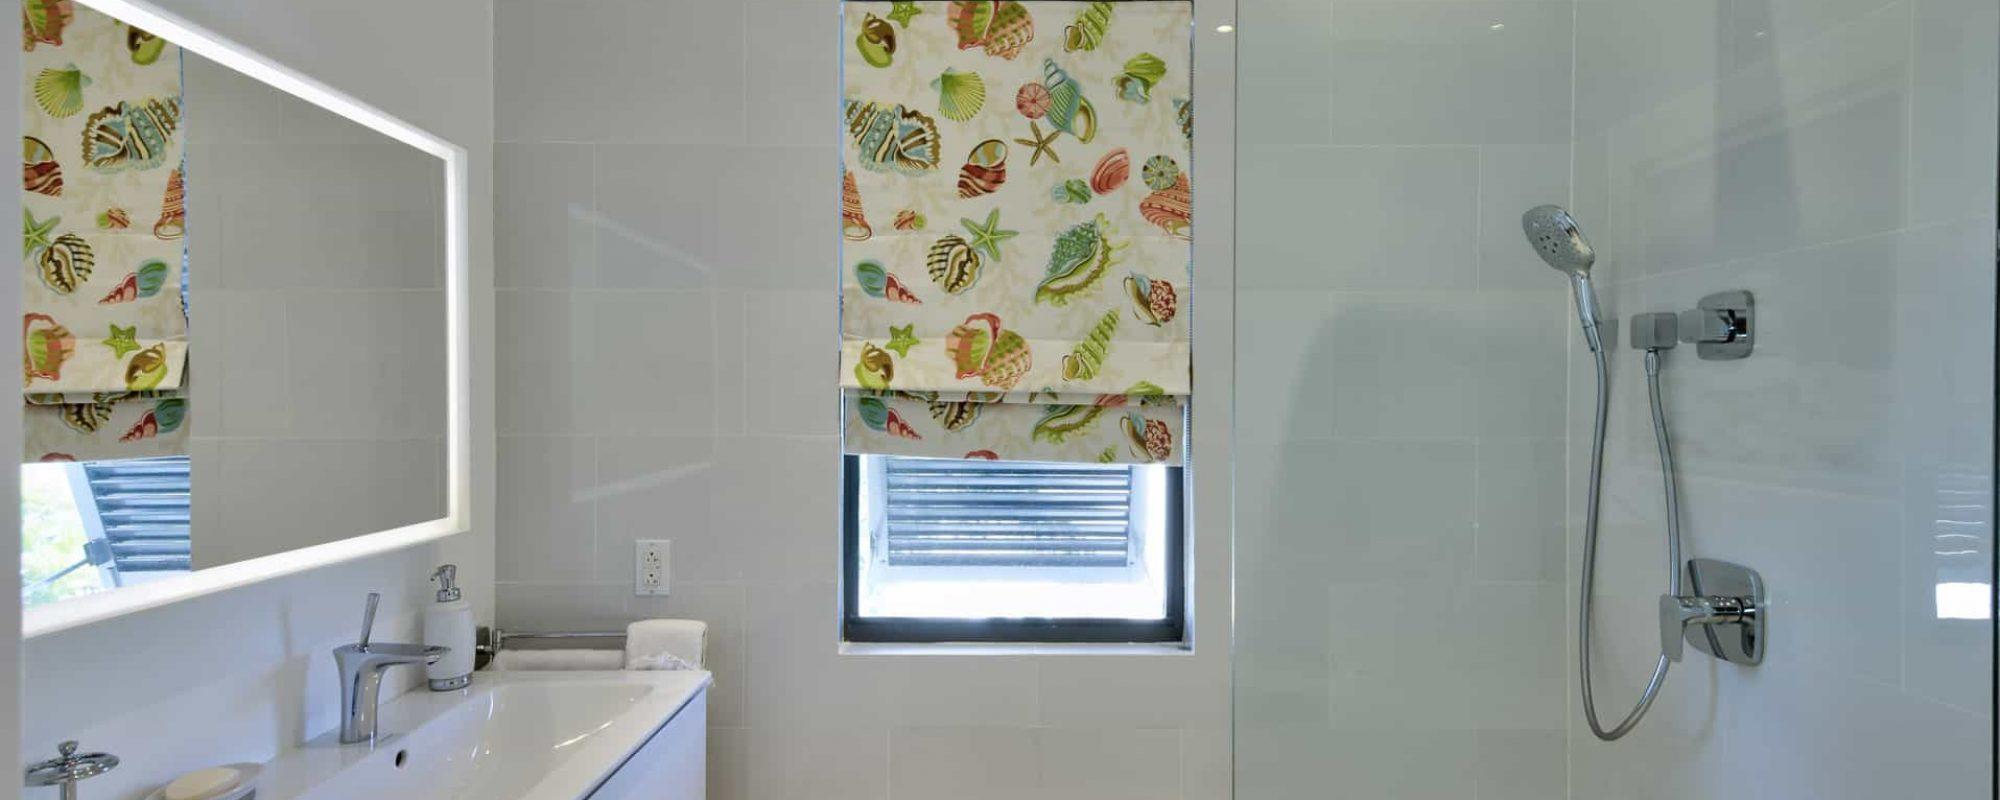 70-twin-beds-bathroom